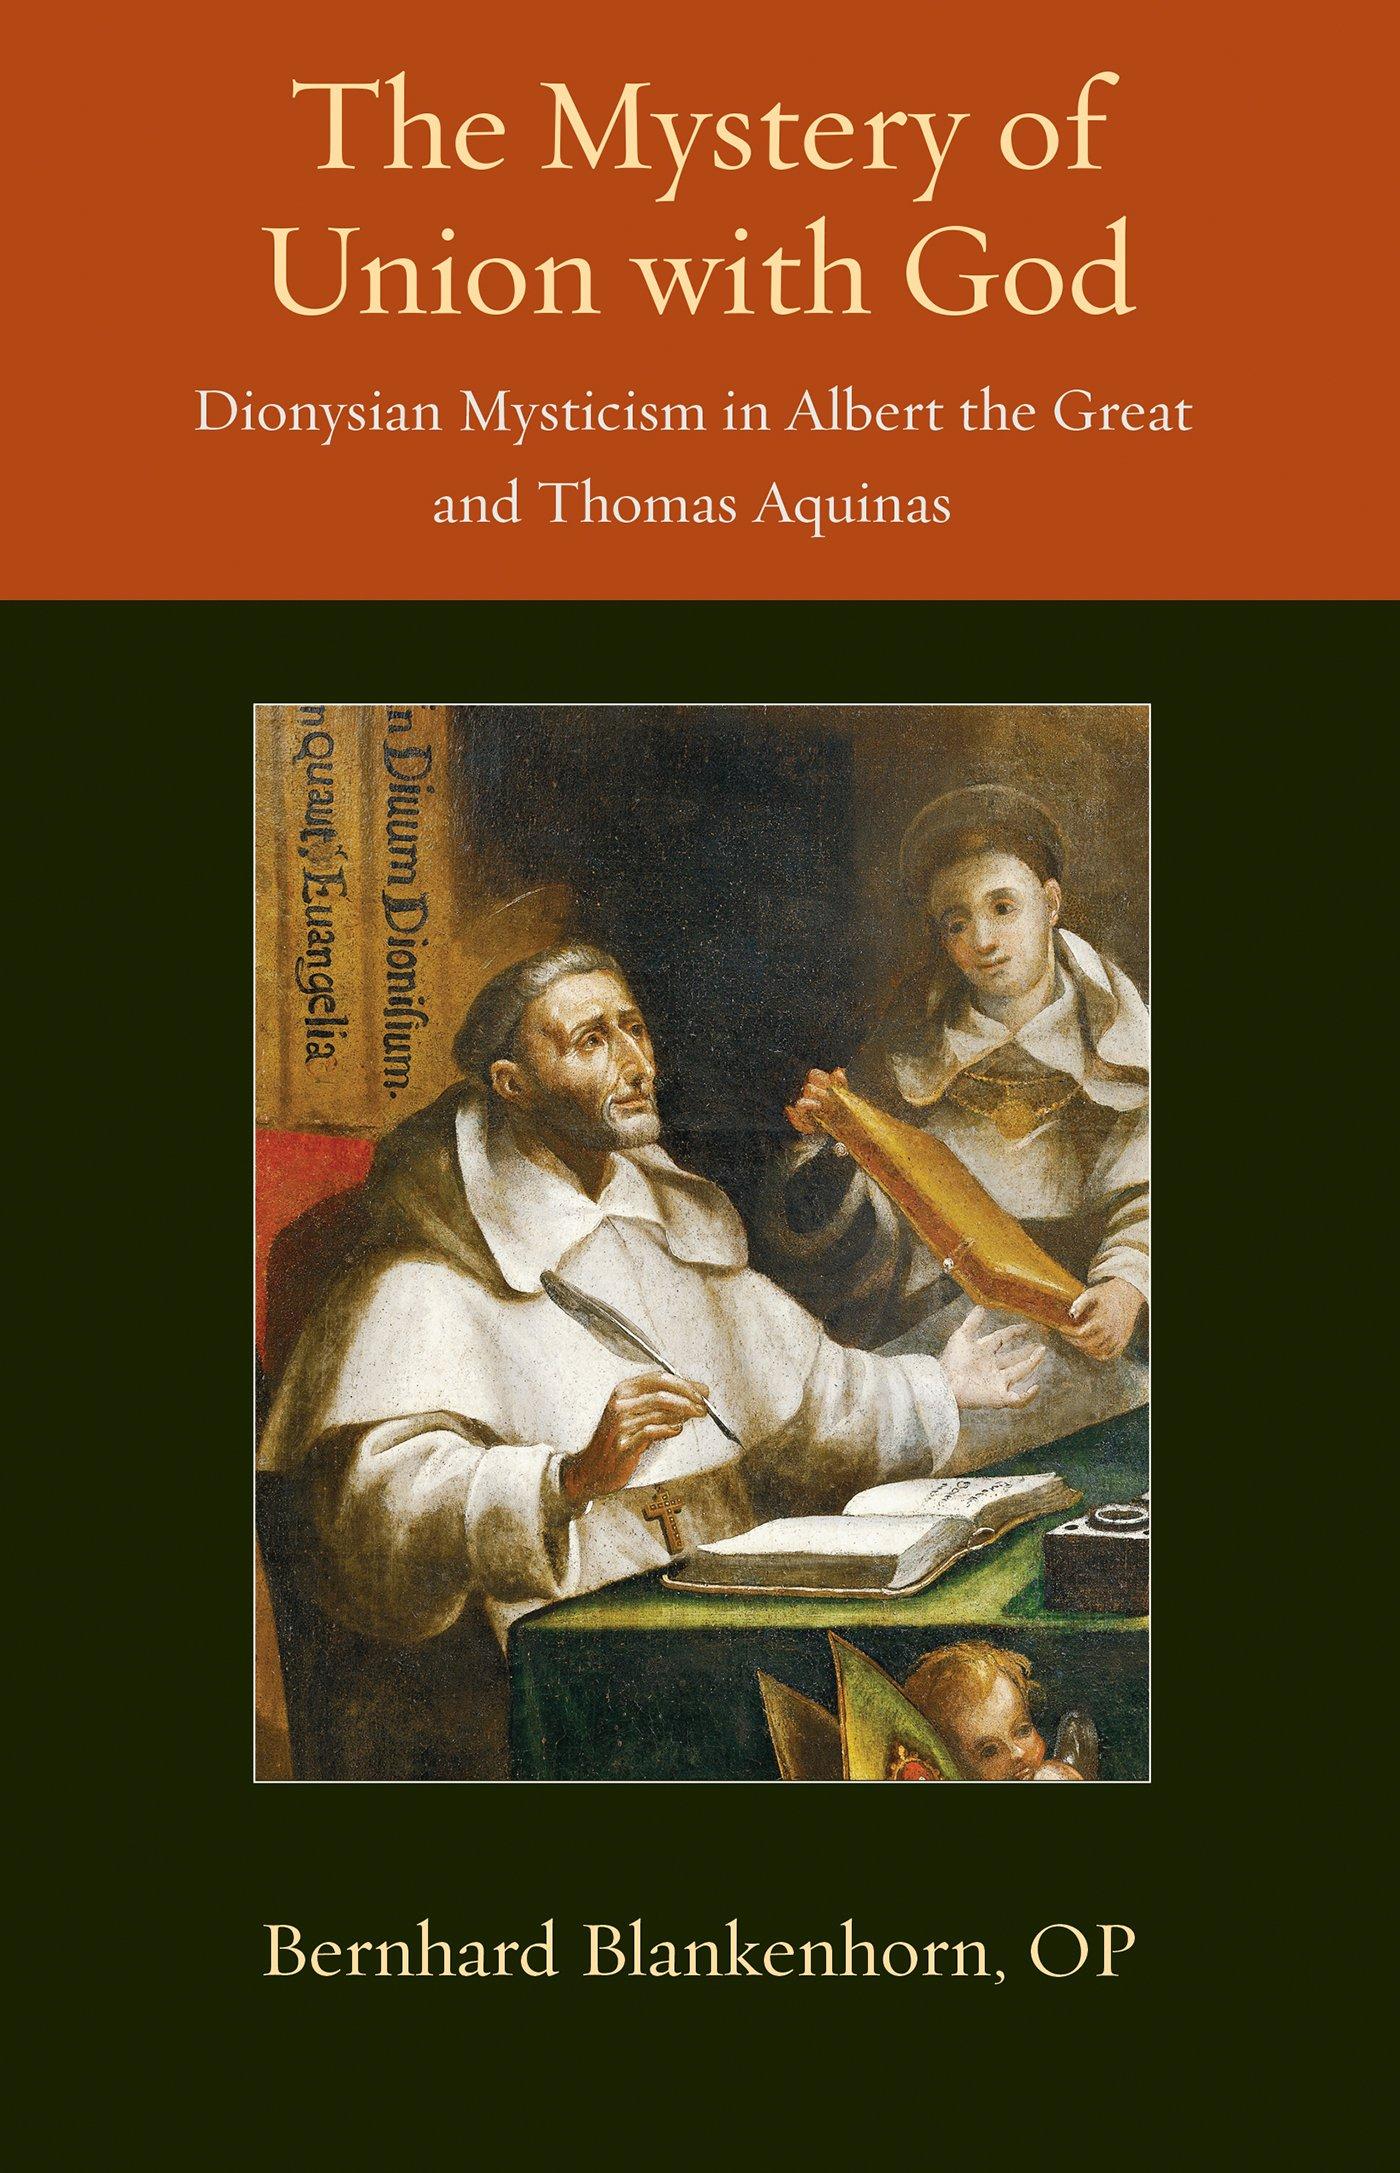 Thomas Aquinas: God and Explanations